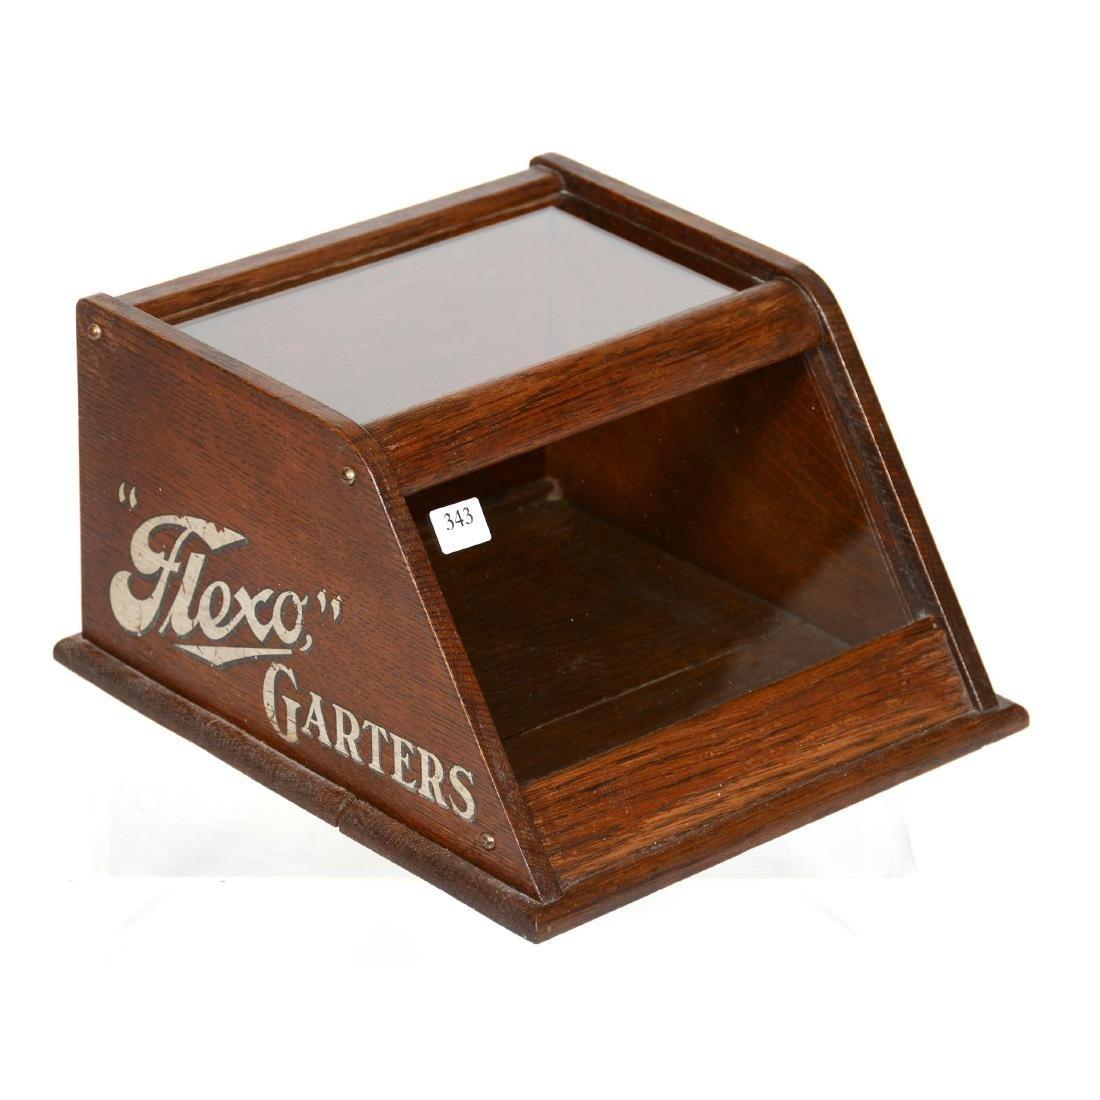 Original Oak Counter Top Garter Display Case with Adver